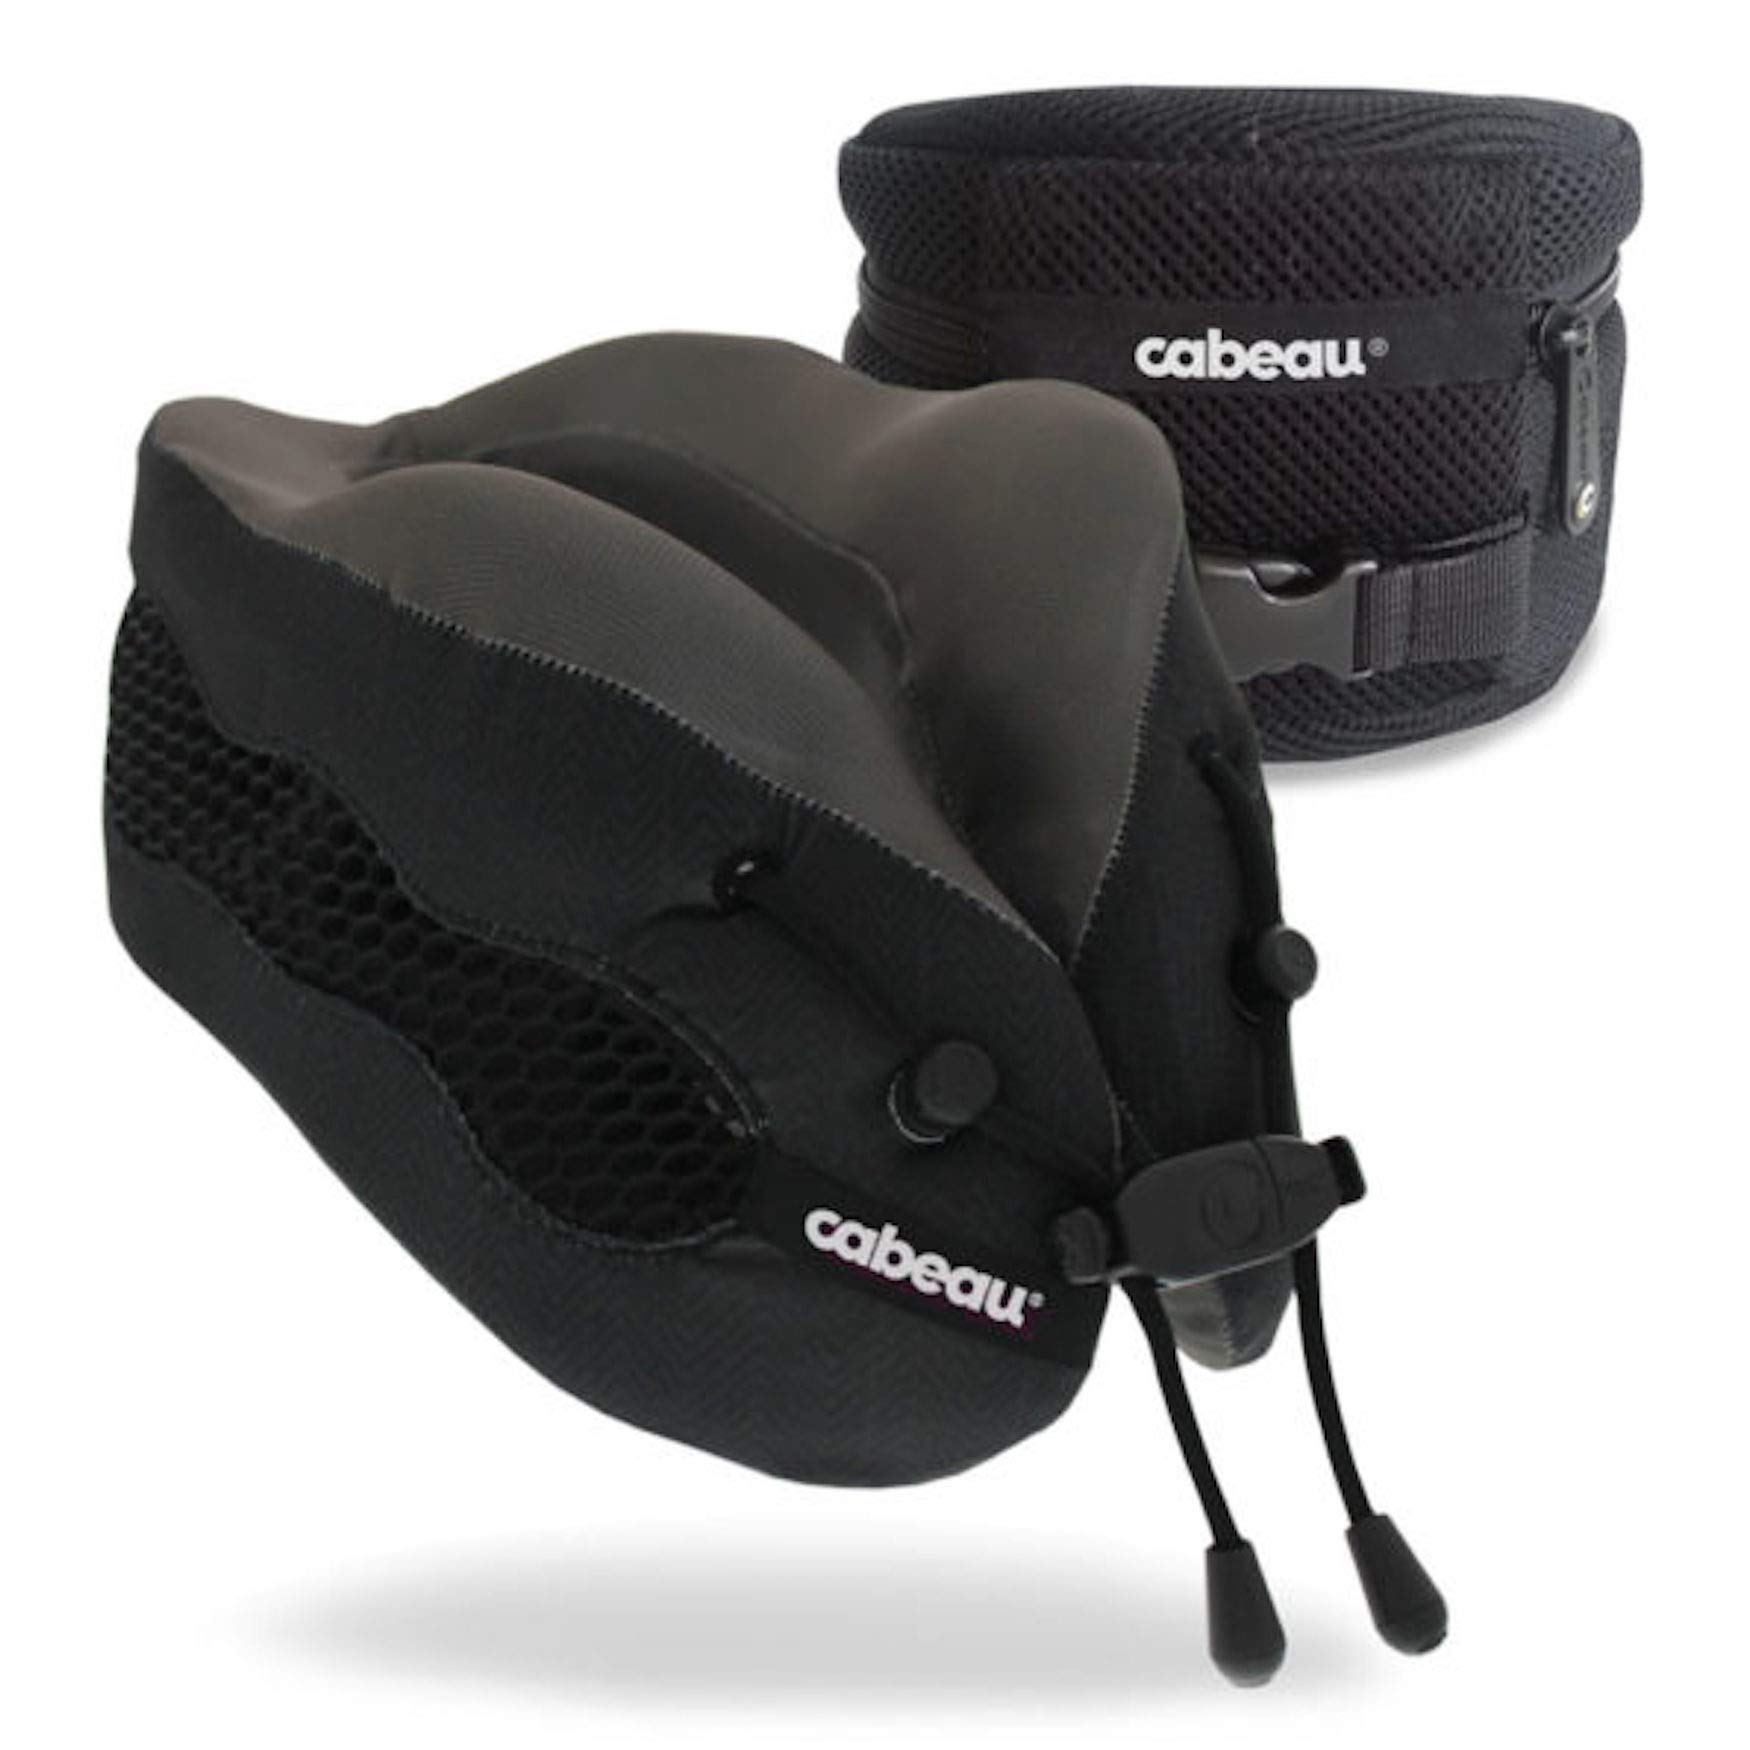 Cabeau Evolution Pillow Circulating Cooling